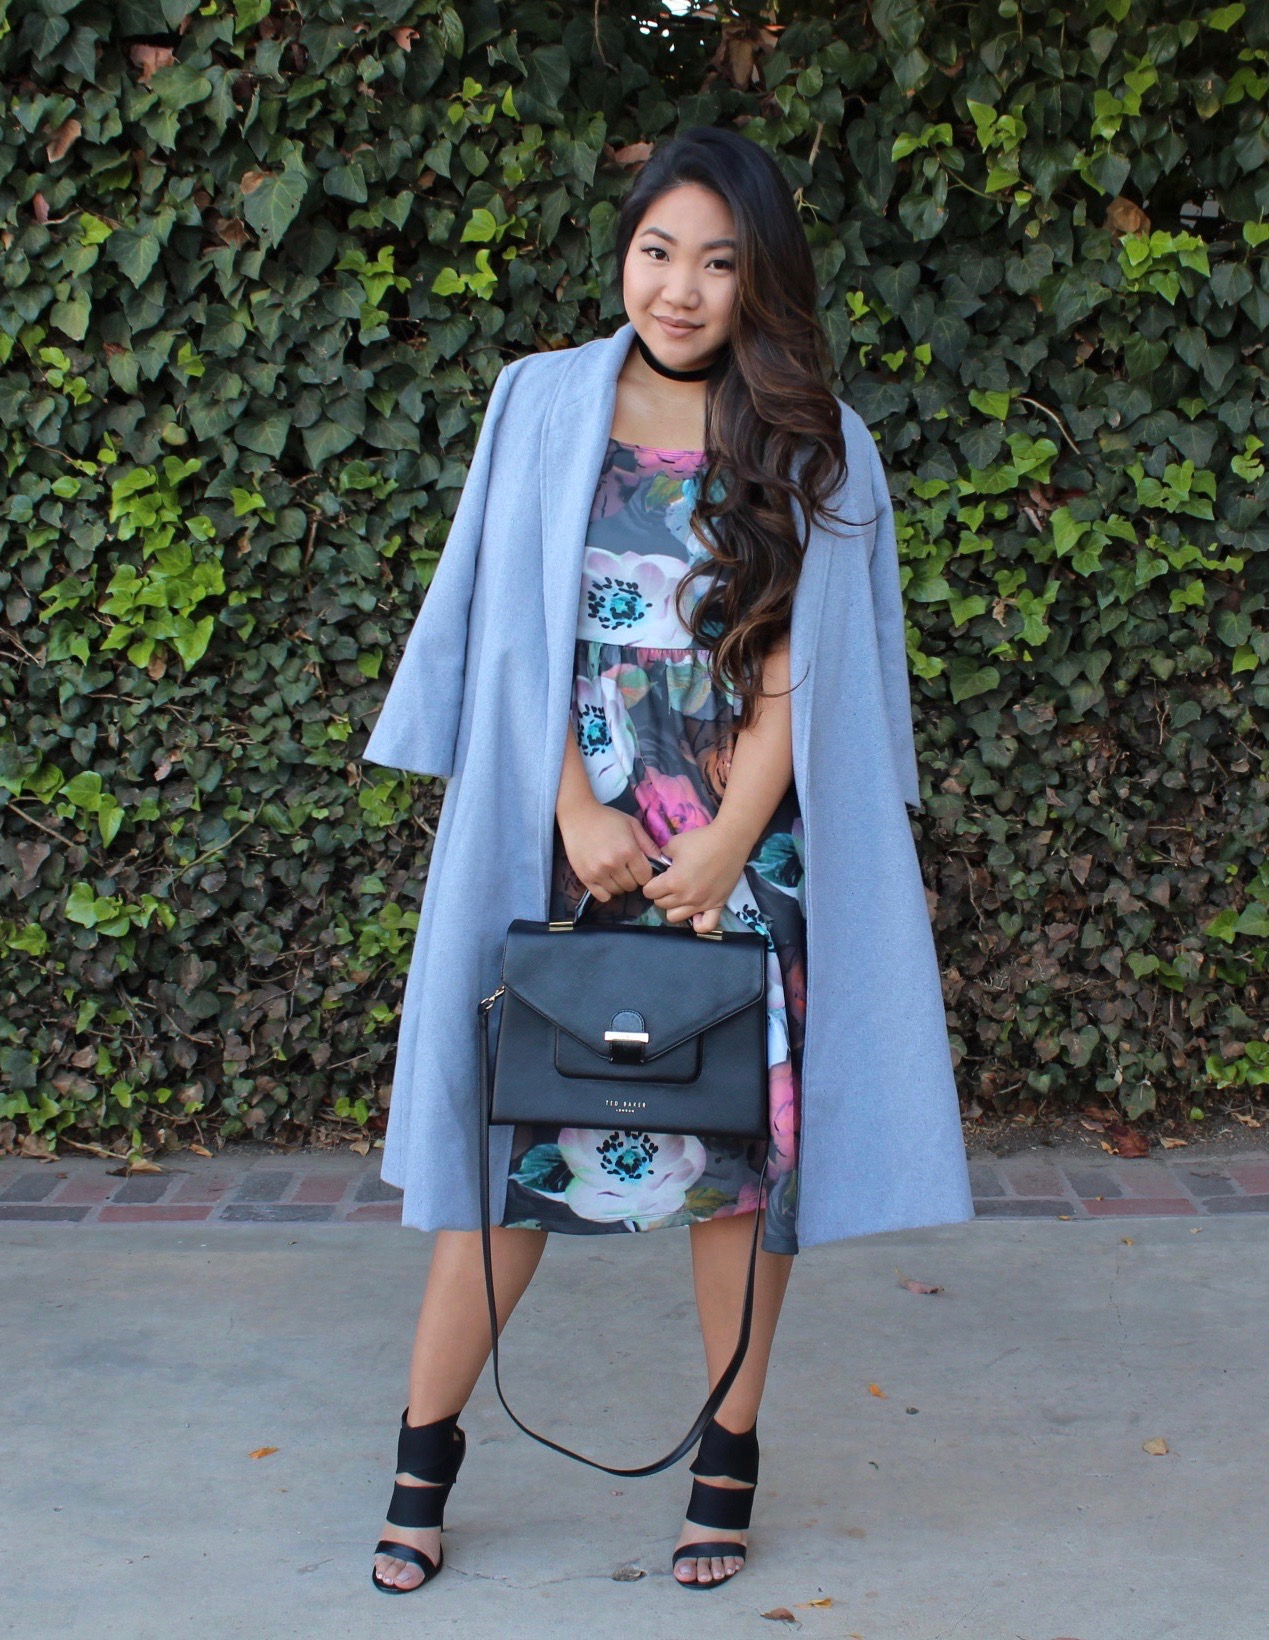 floral-midi-dress - ASOS Floral Midi Dress